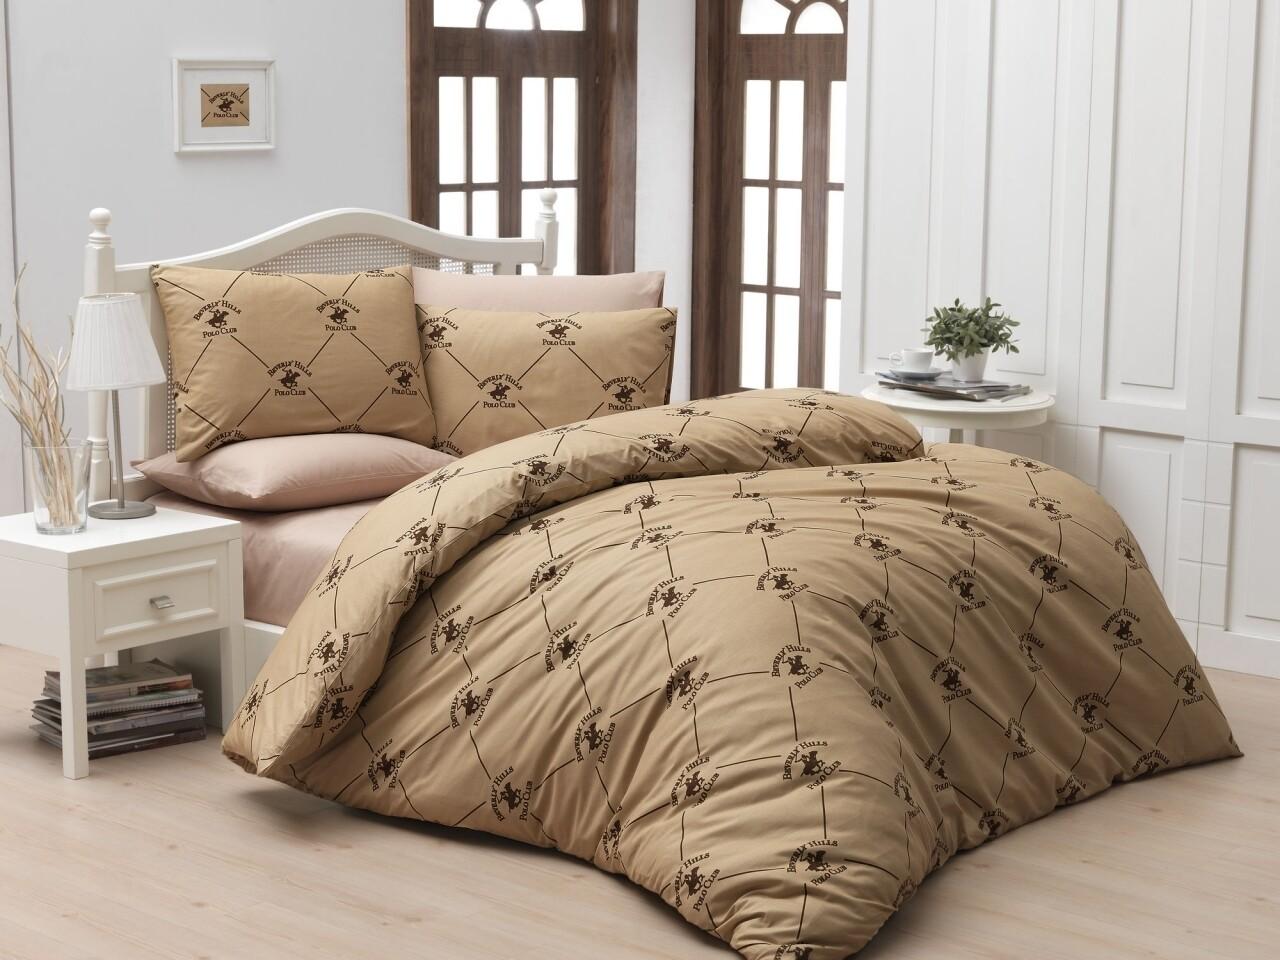 Lenjerie de pat pentru o persoana, Creamy, Beverly Hills Polo Club, 3 piese, 160 x 240 cm, 100% bumbac ranforce, crem/maro